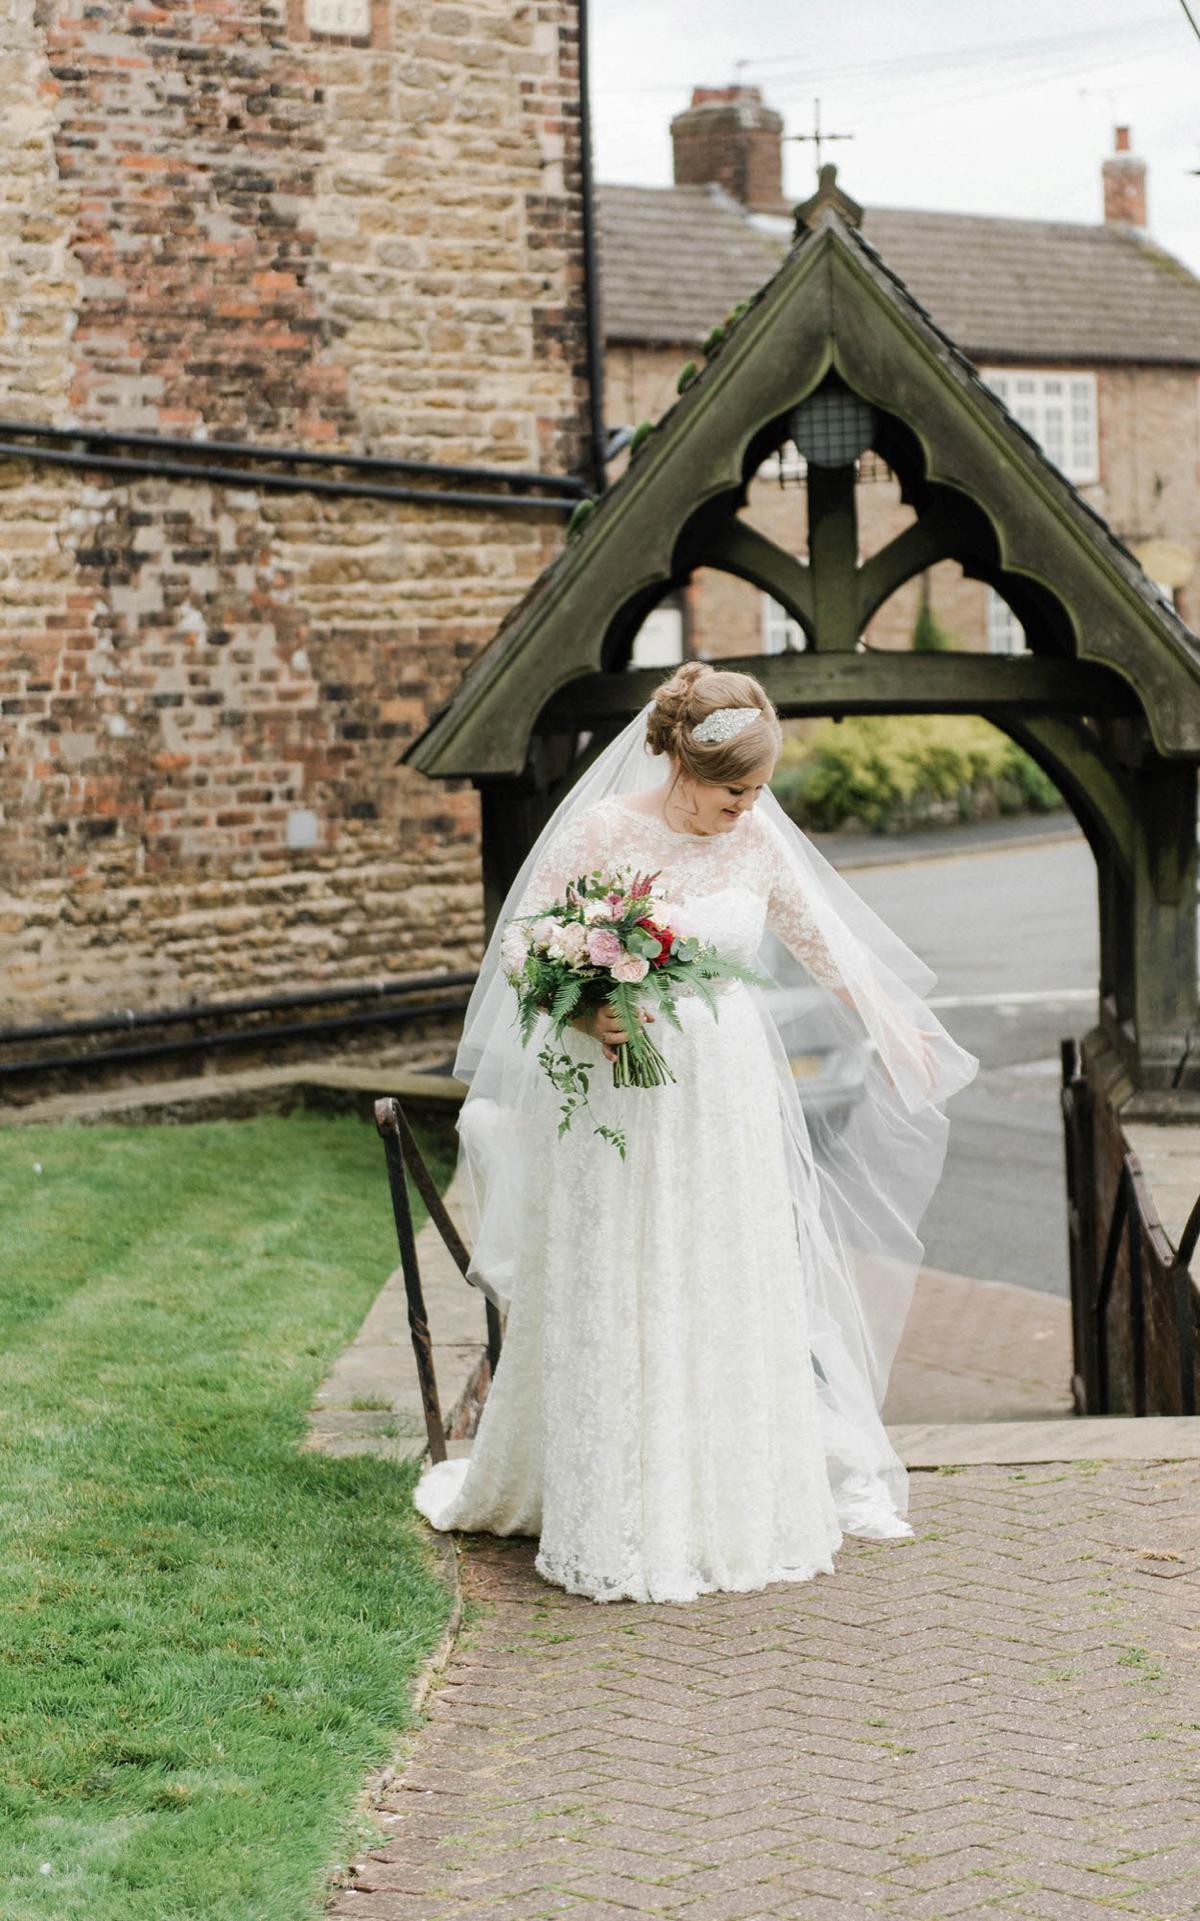 6a23397bbc158 ... A bride who made her own dress for her elegant garden party wedding - A  Bride